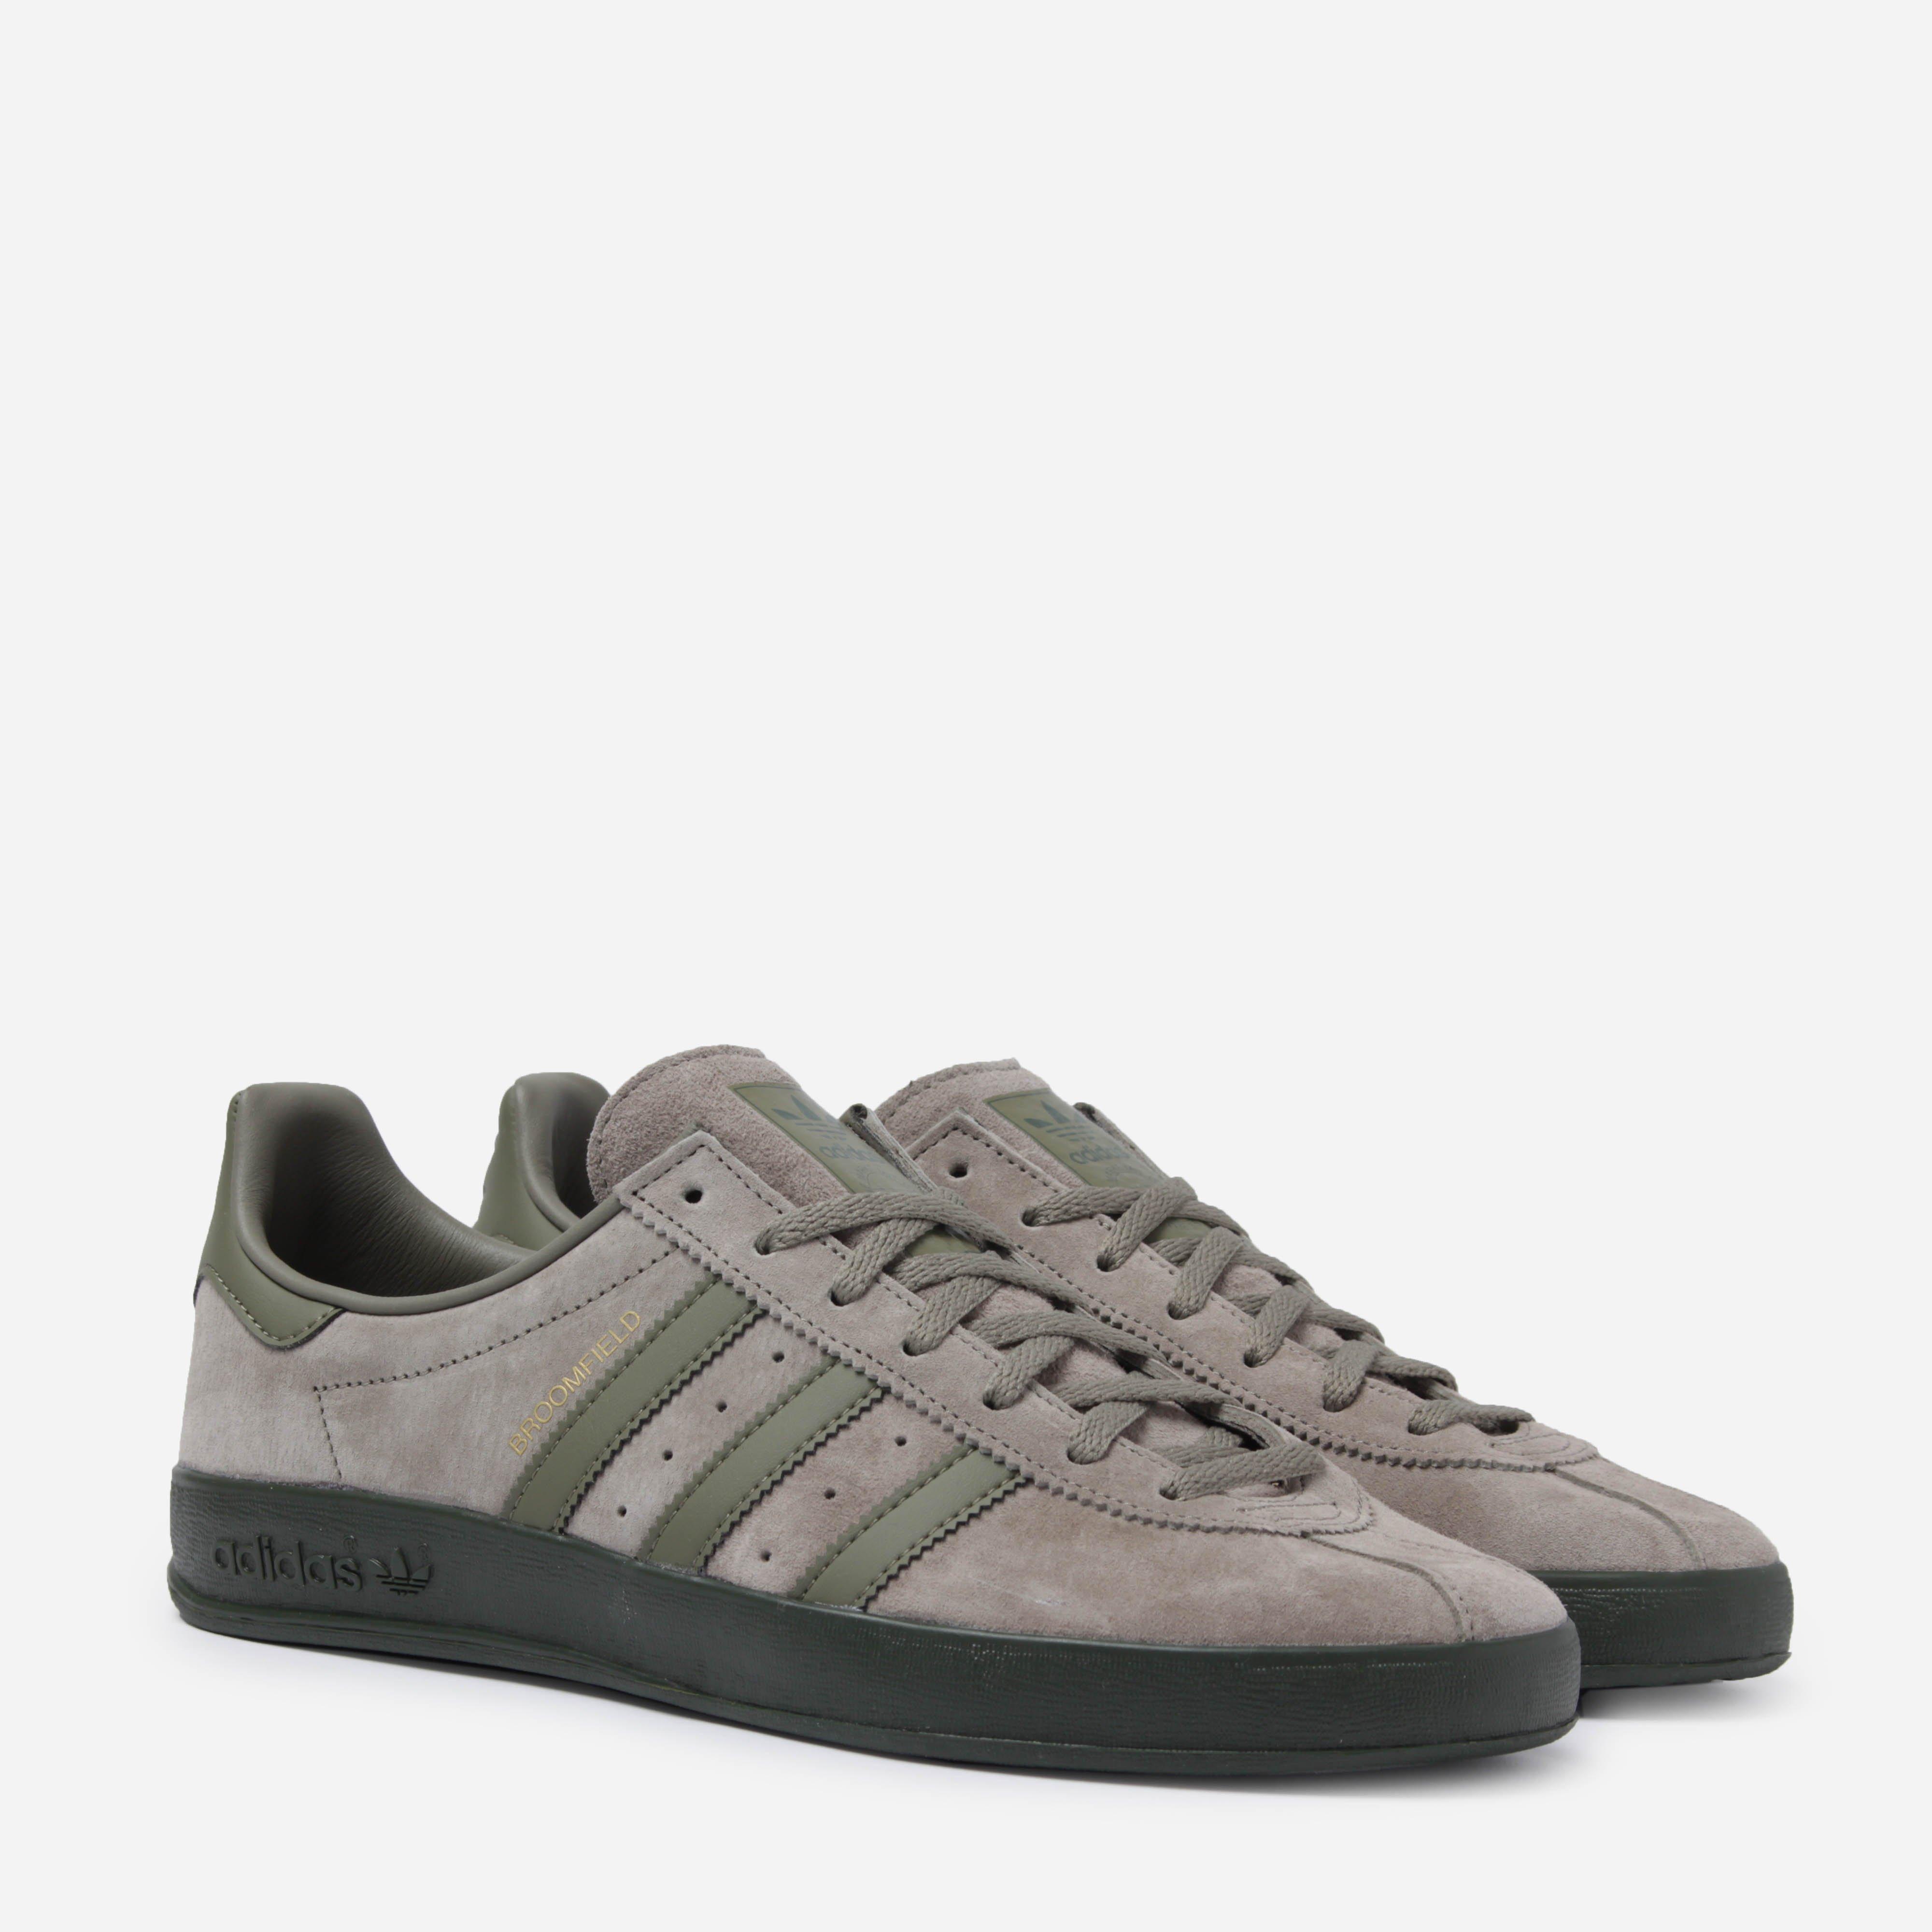 newest 2b0cd 04423 adidas Originals